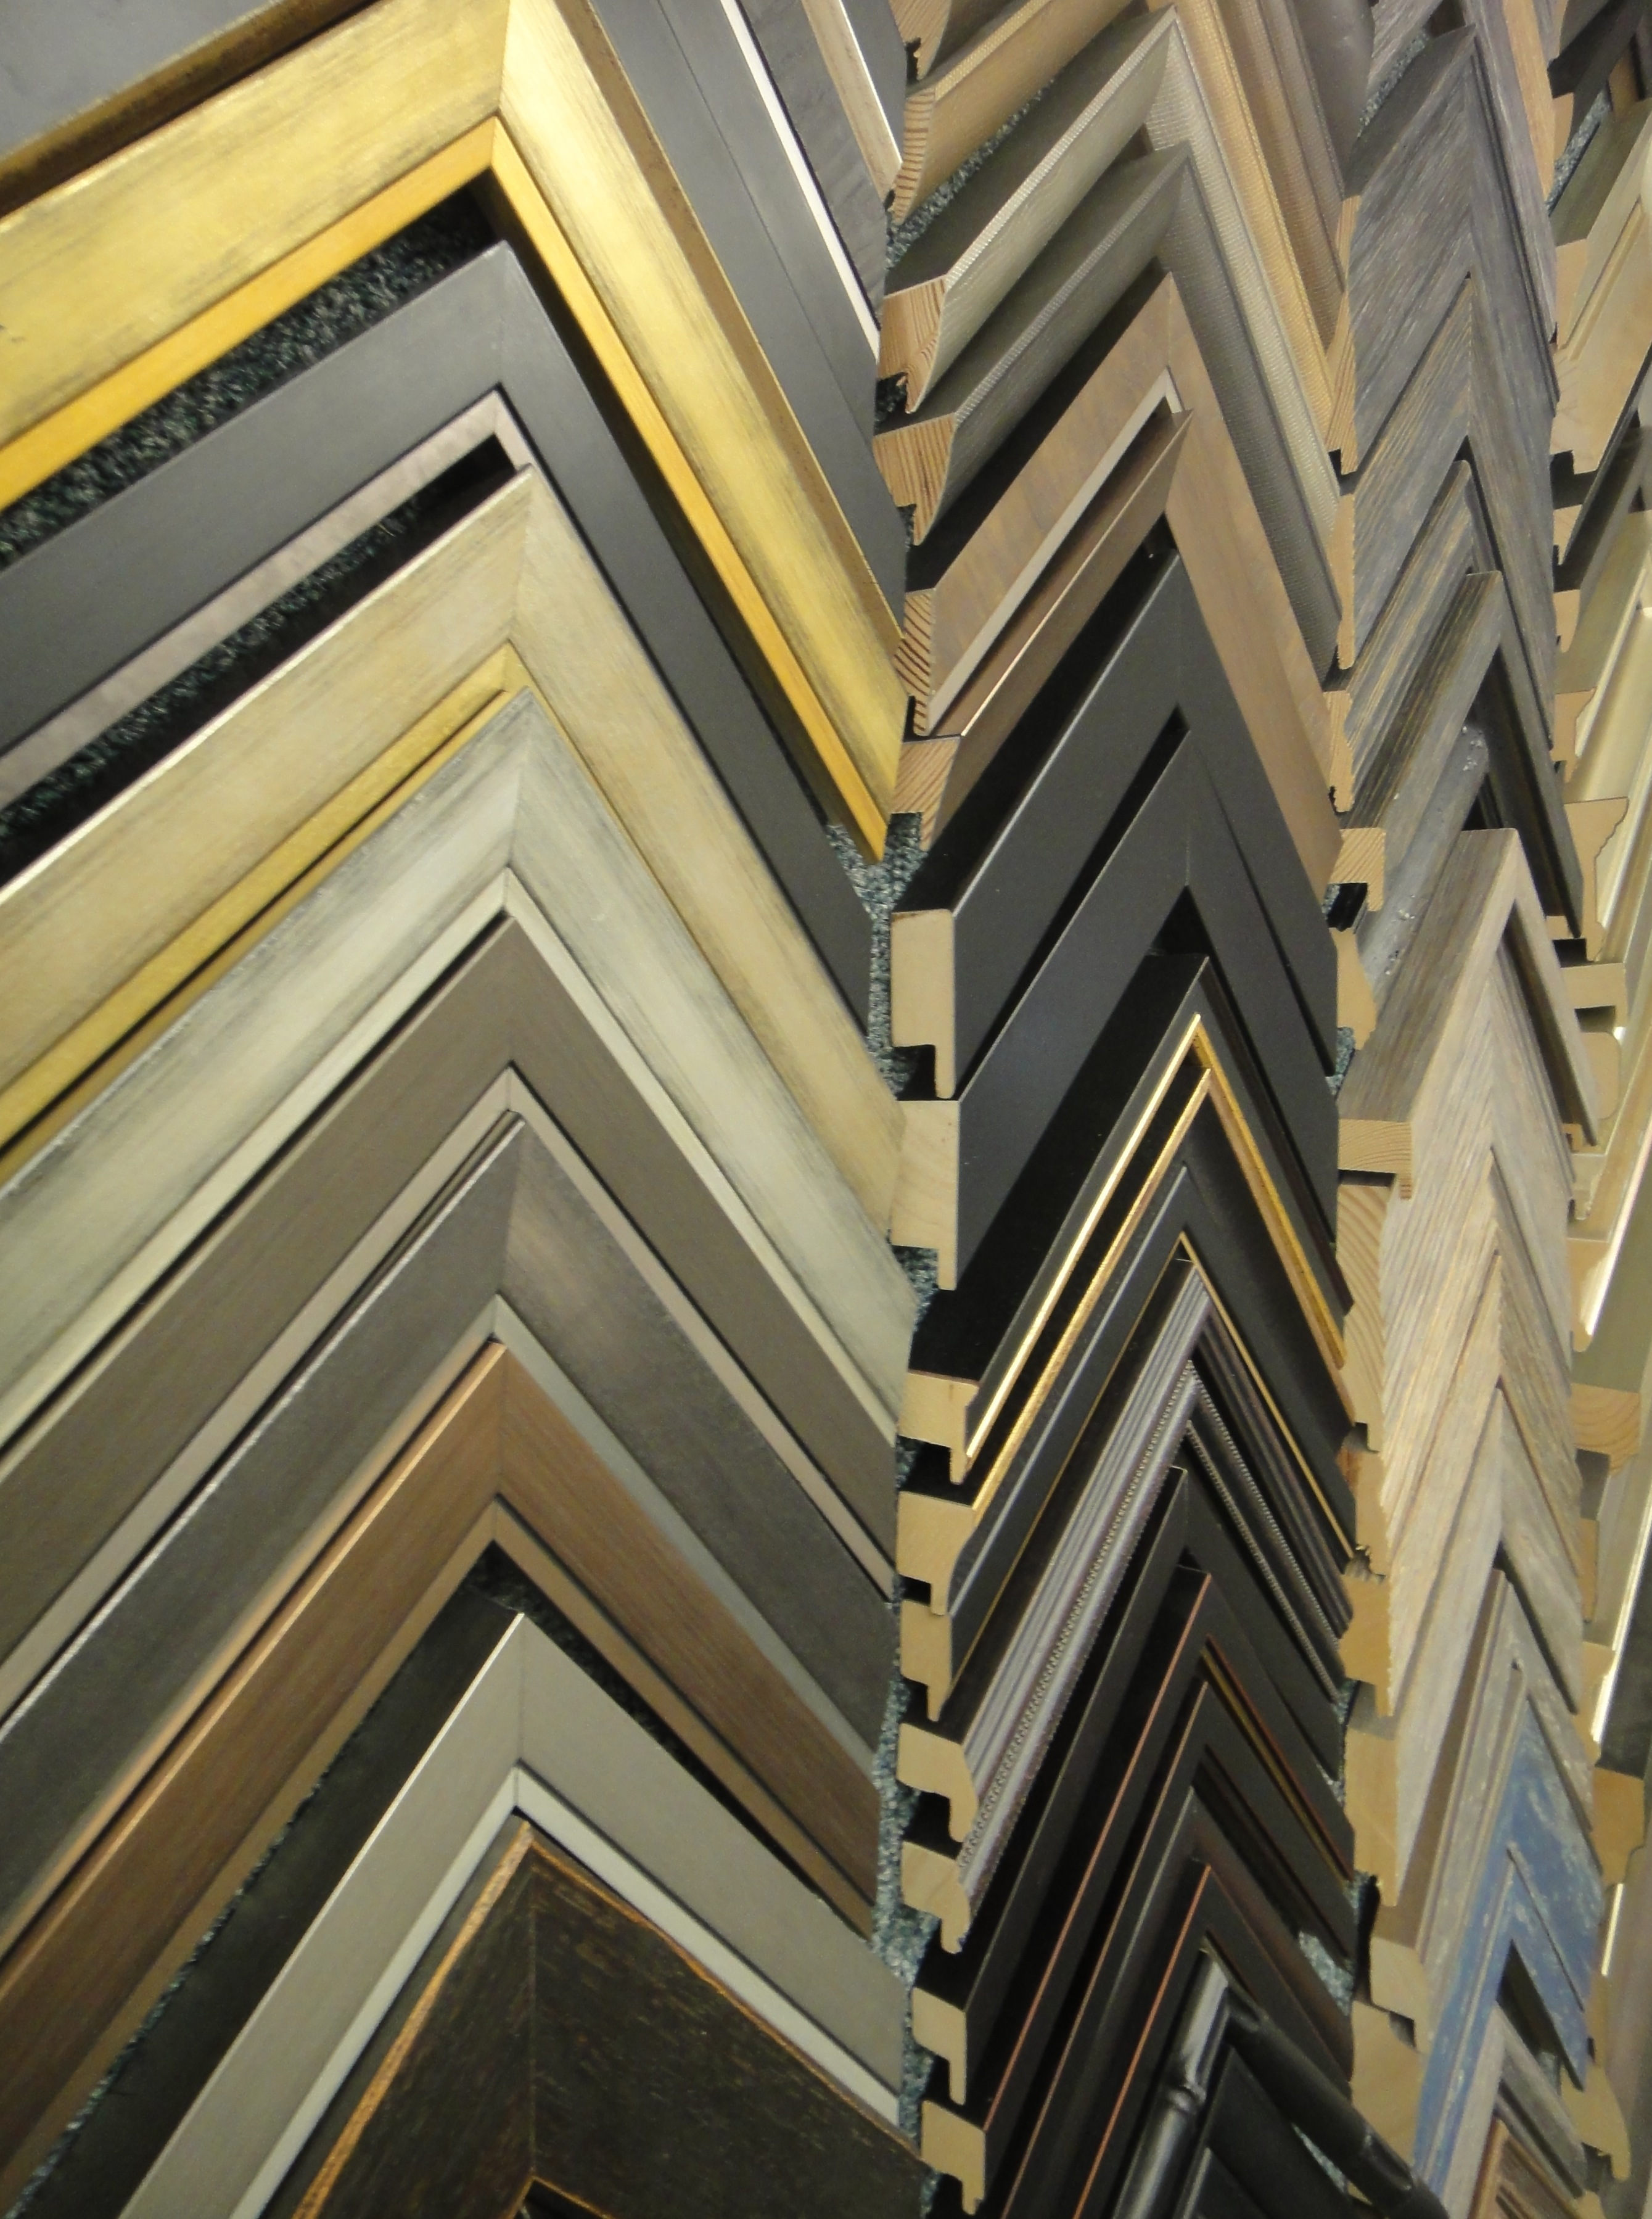 Wall display of Art Frames